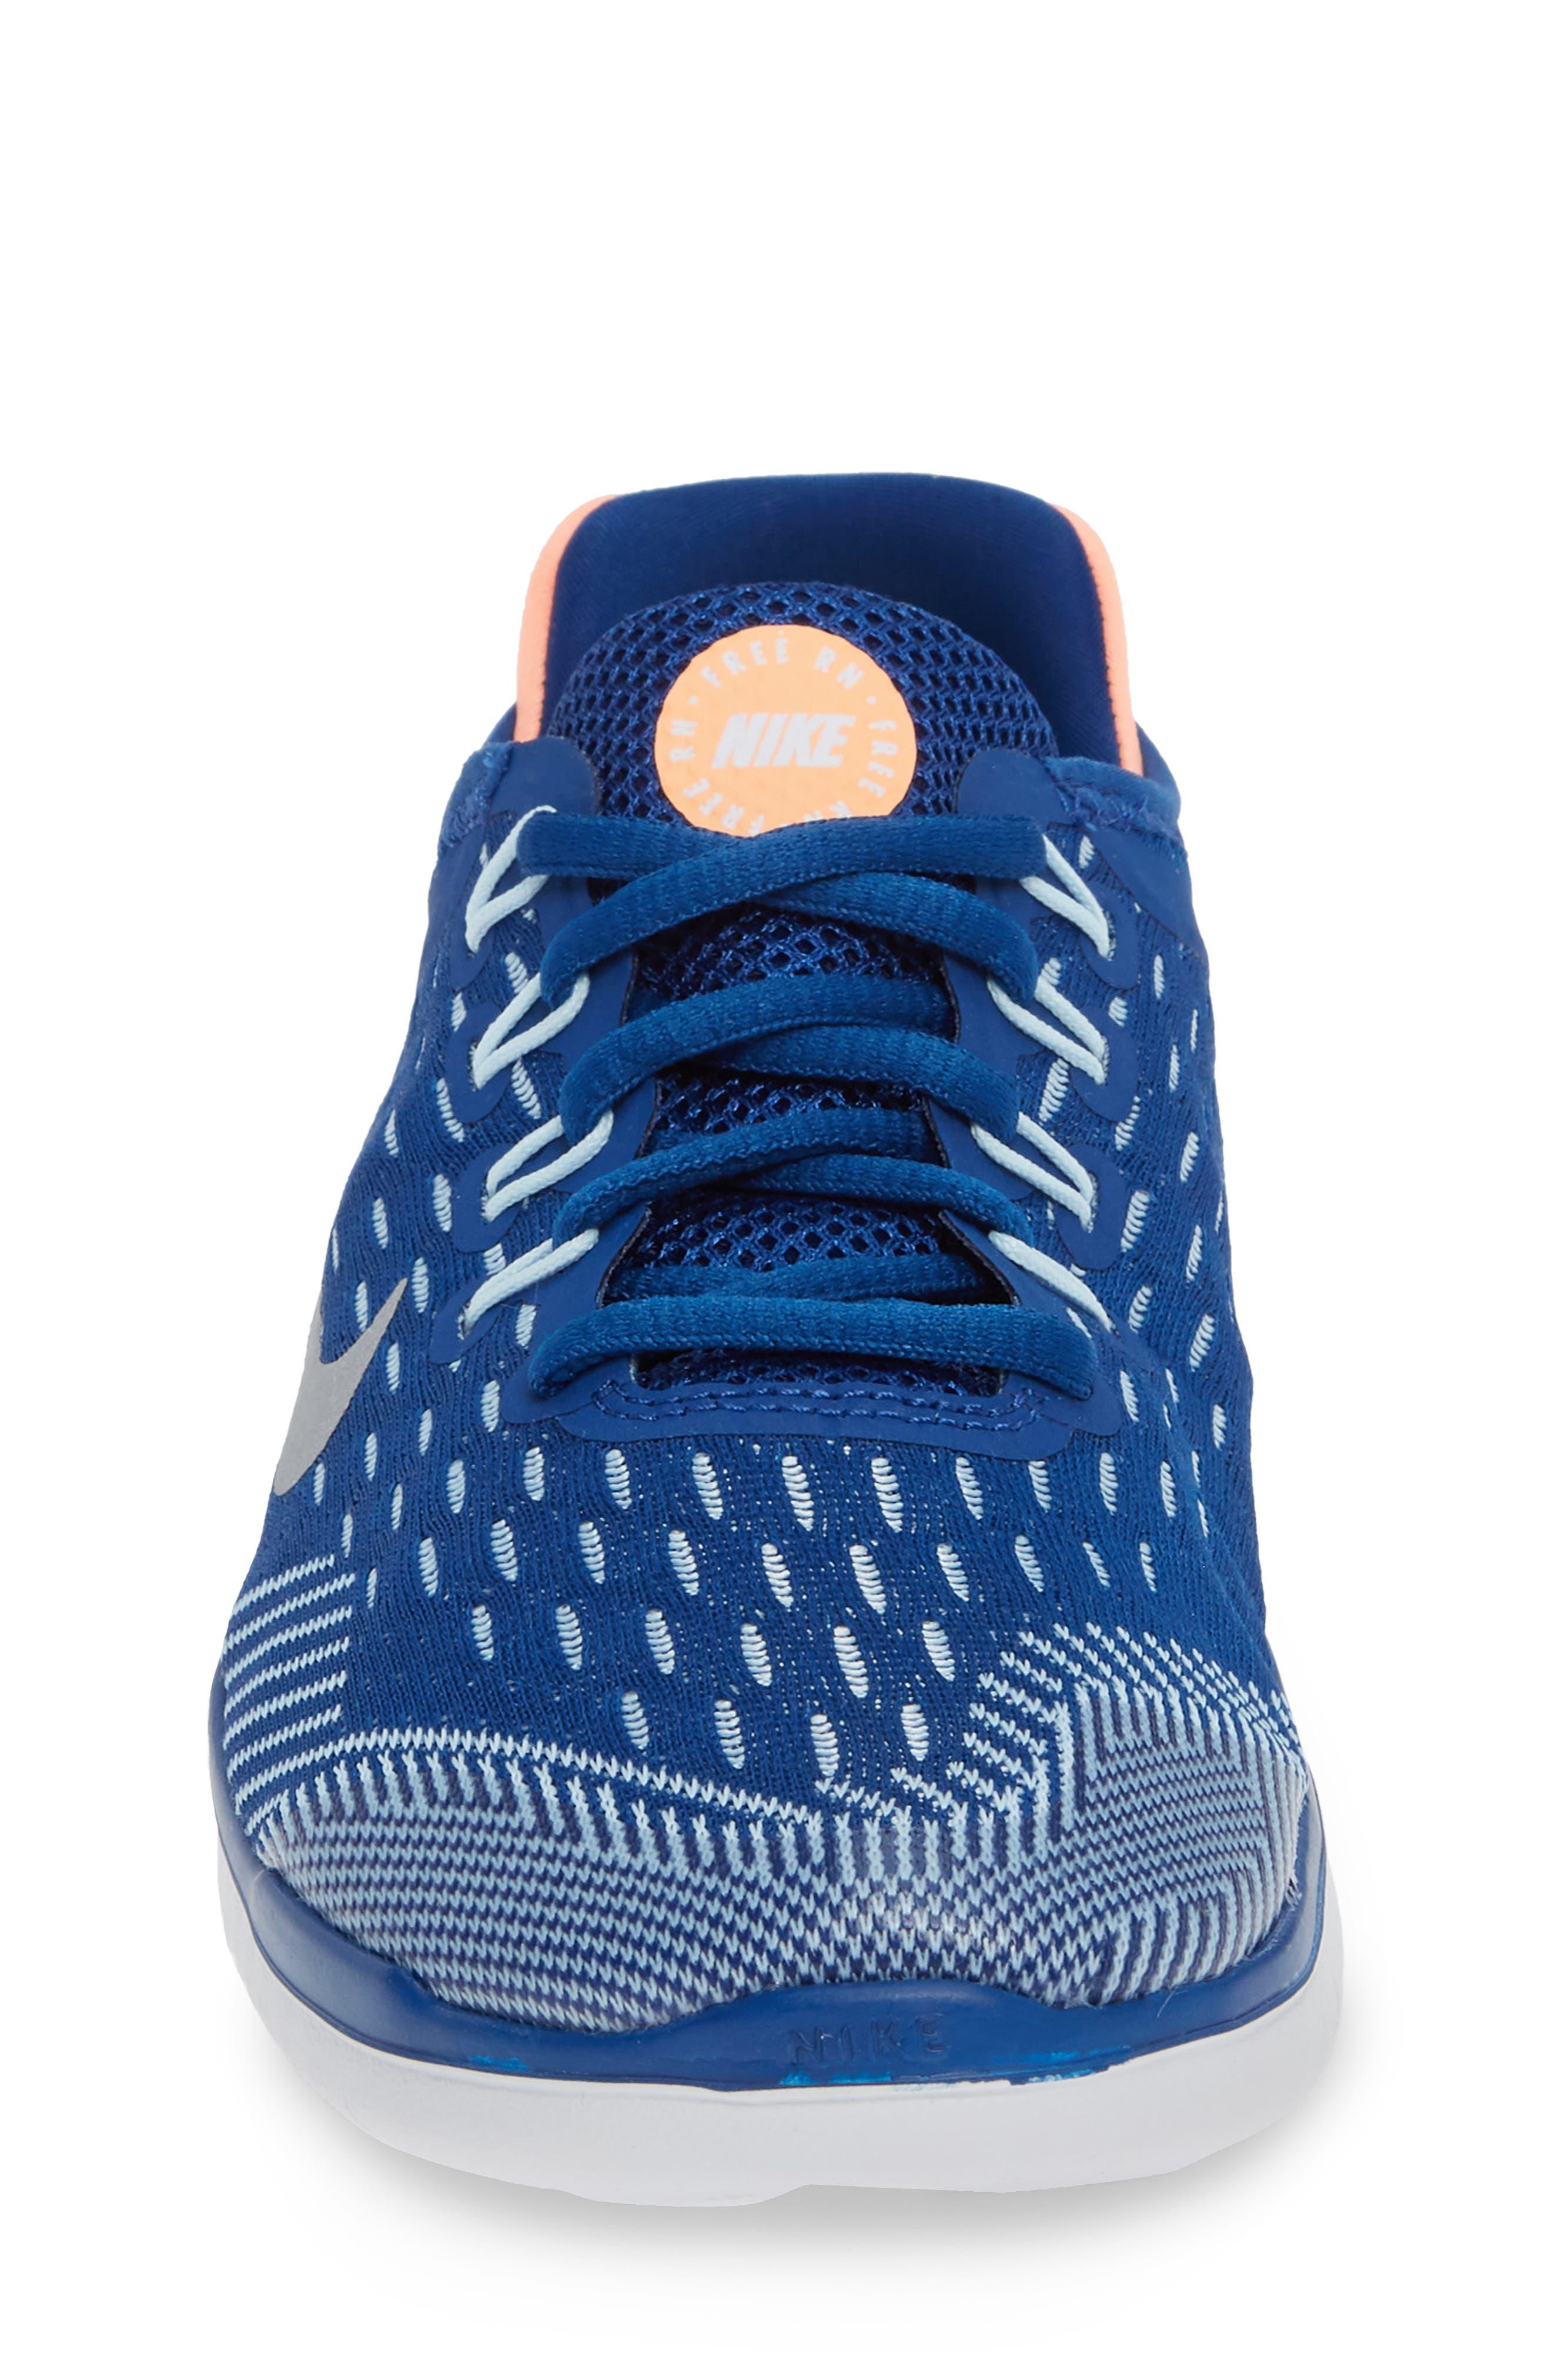 Free RN 2018 Running Shoe,                             Alternate thumbnail 4, color,                             GYM BLUE/ METALLIC SILVER